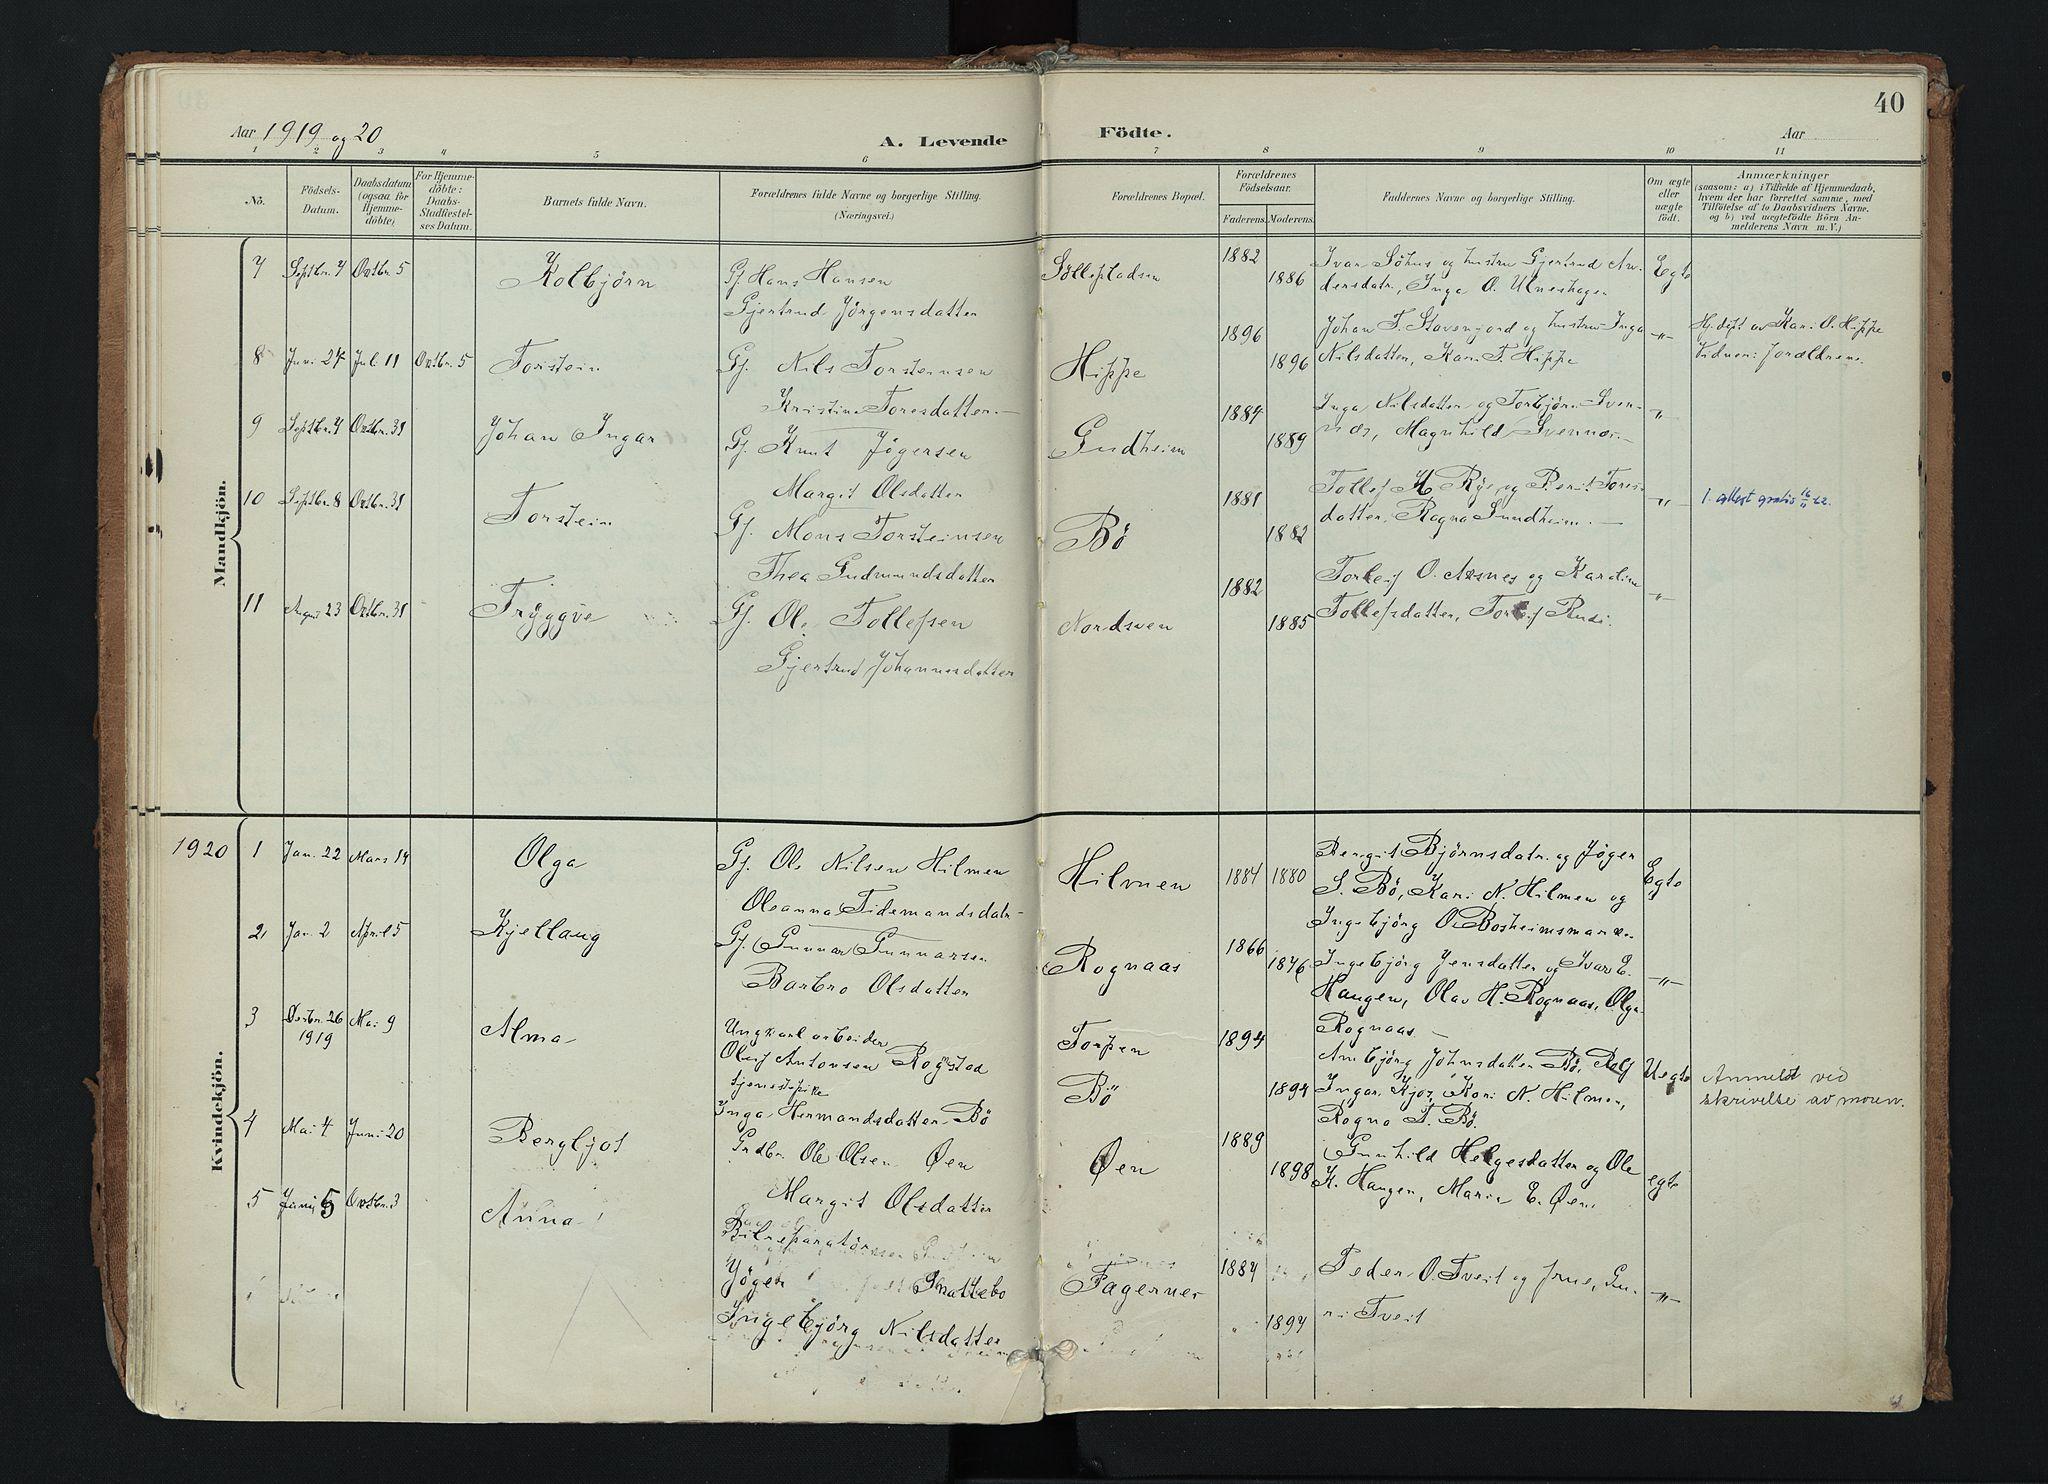 SAH, Nord-Aurdal prestekontor, Ministerialbok nr. 17, 1897-1926, s. 40